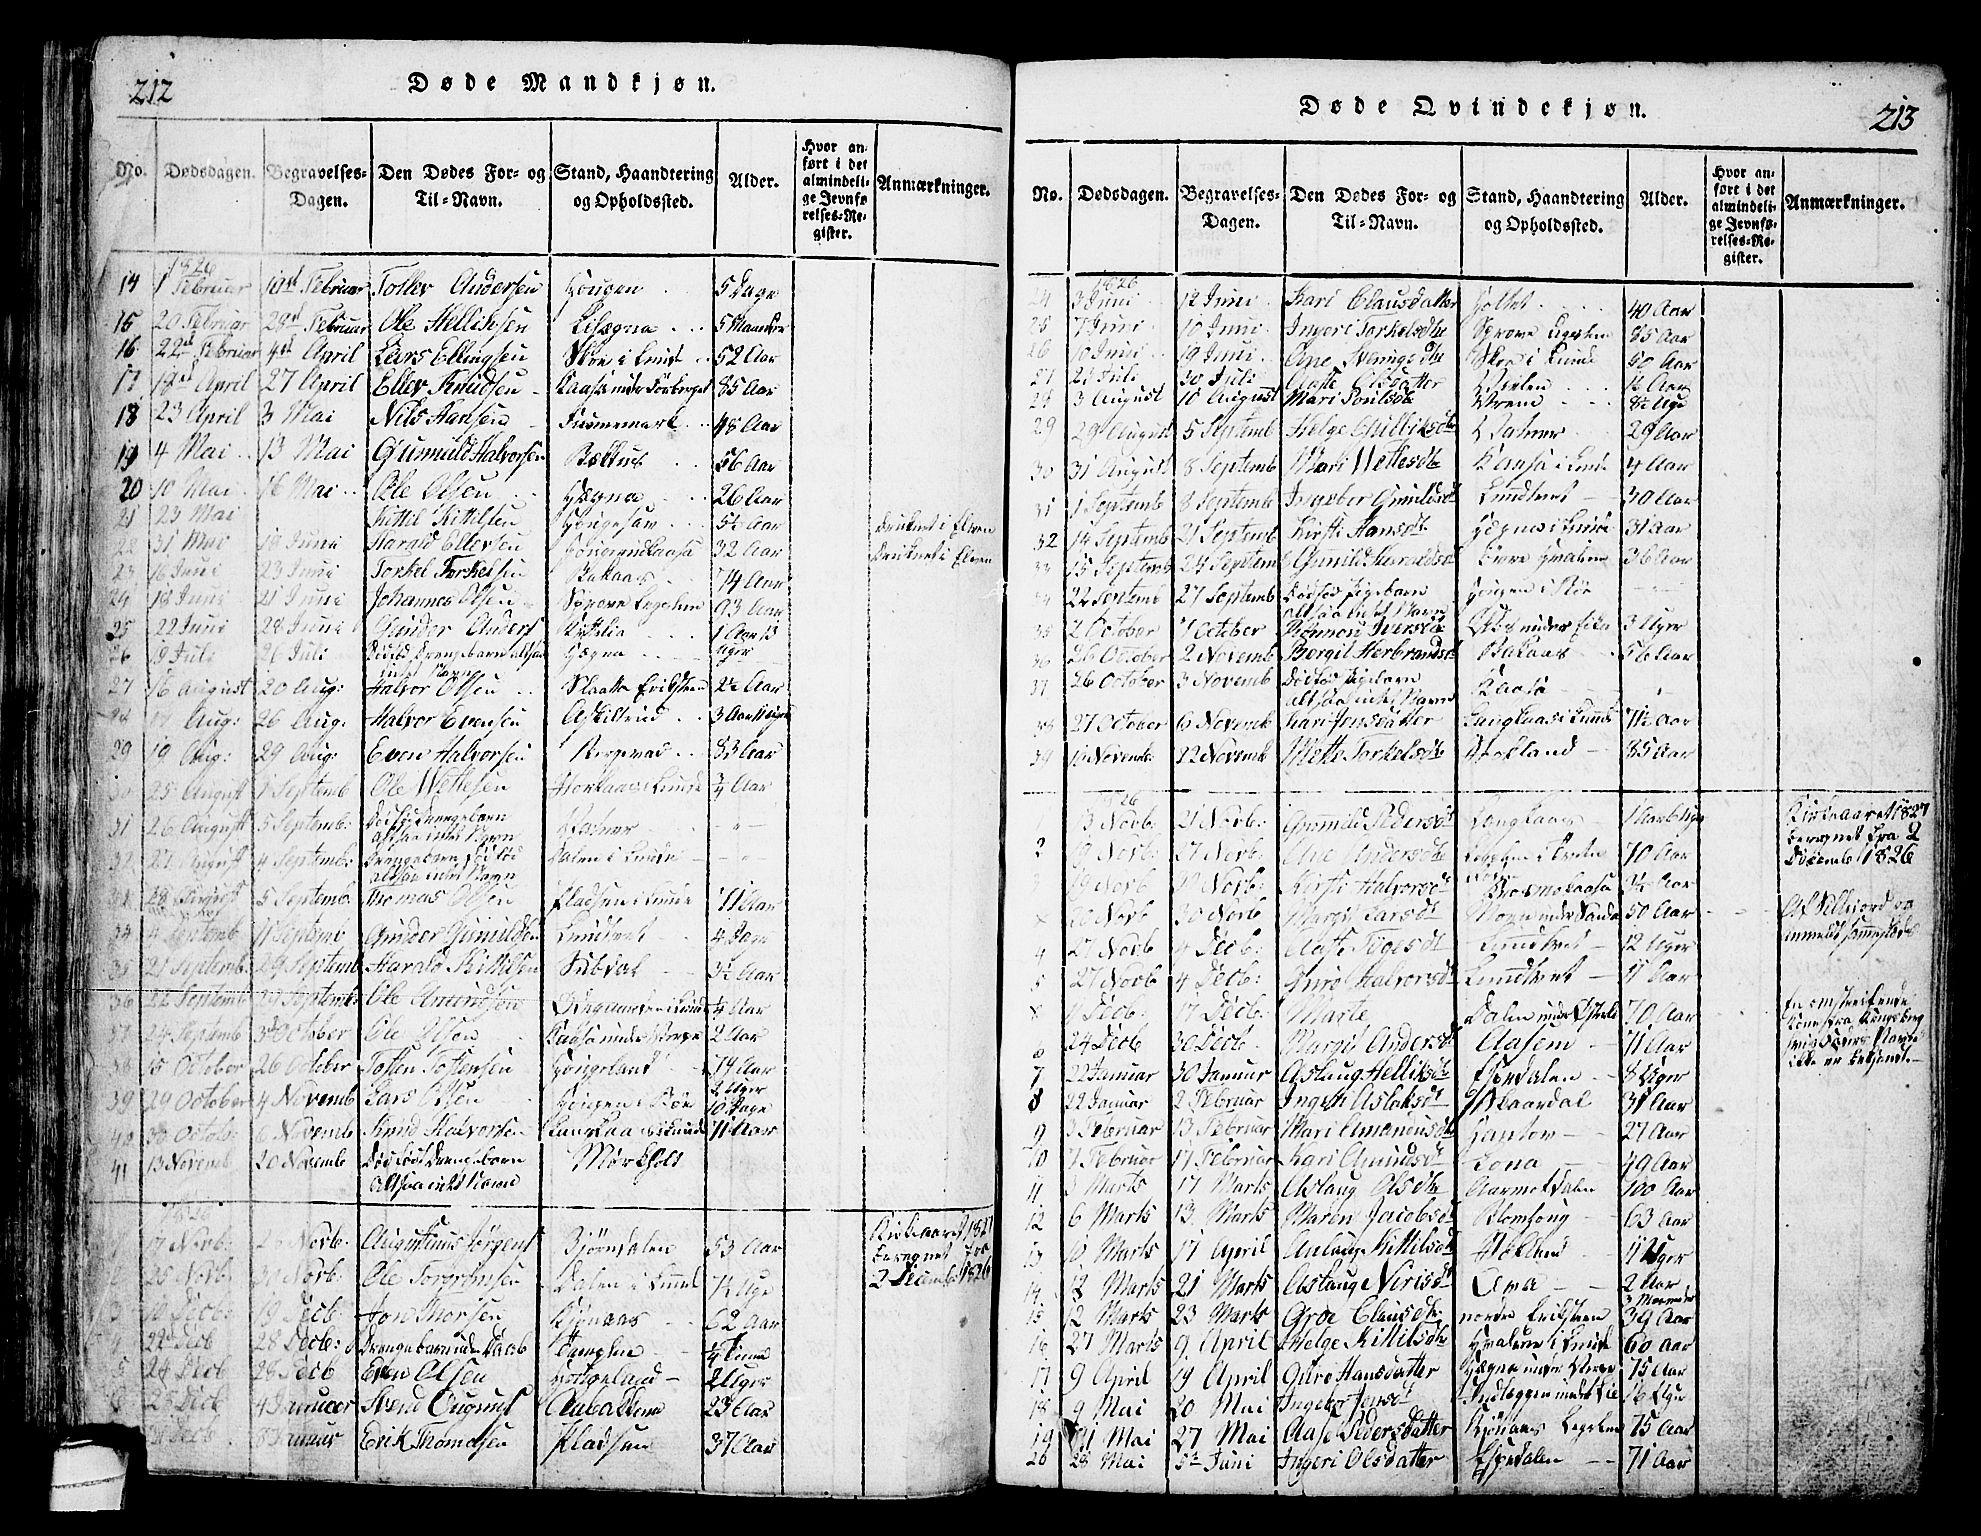 SAKO, Bø kirkebøker, G/Ga/L0001: Klokkerbok nr. 1, 1815-1831, s. 212-213